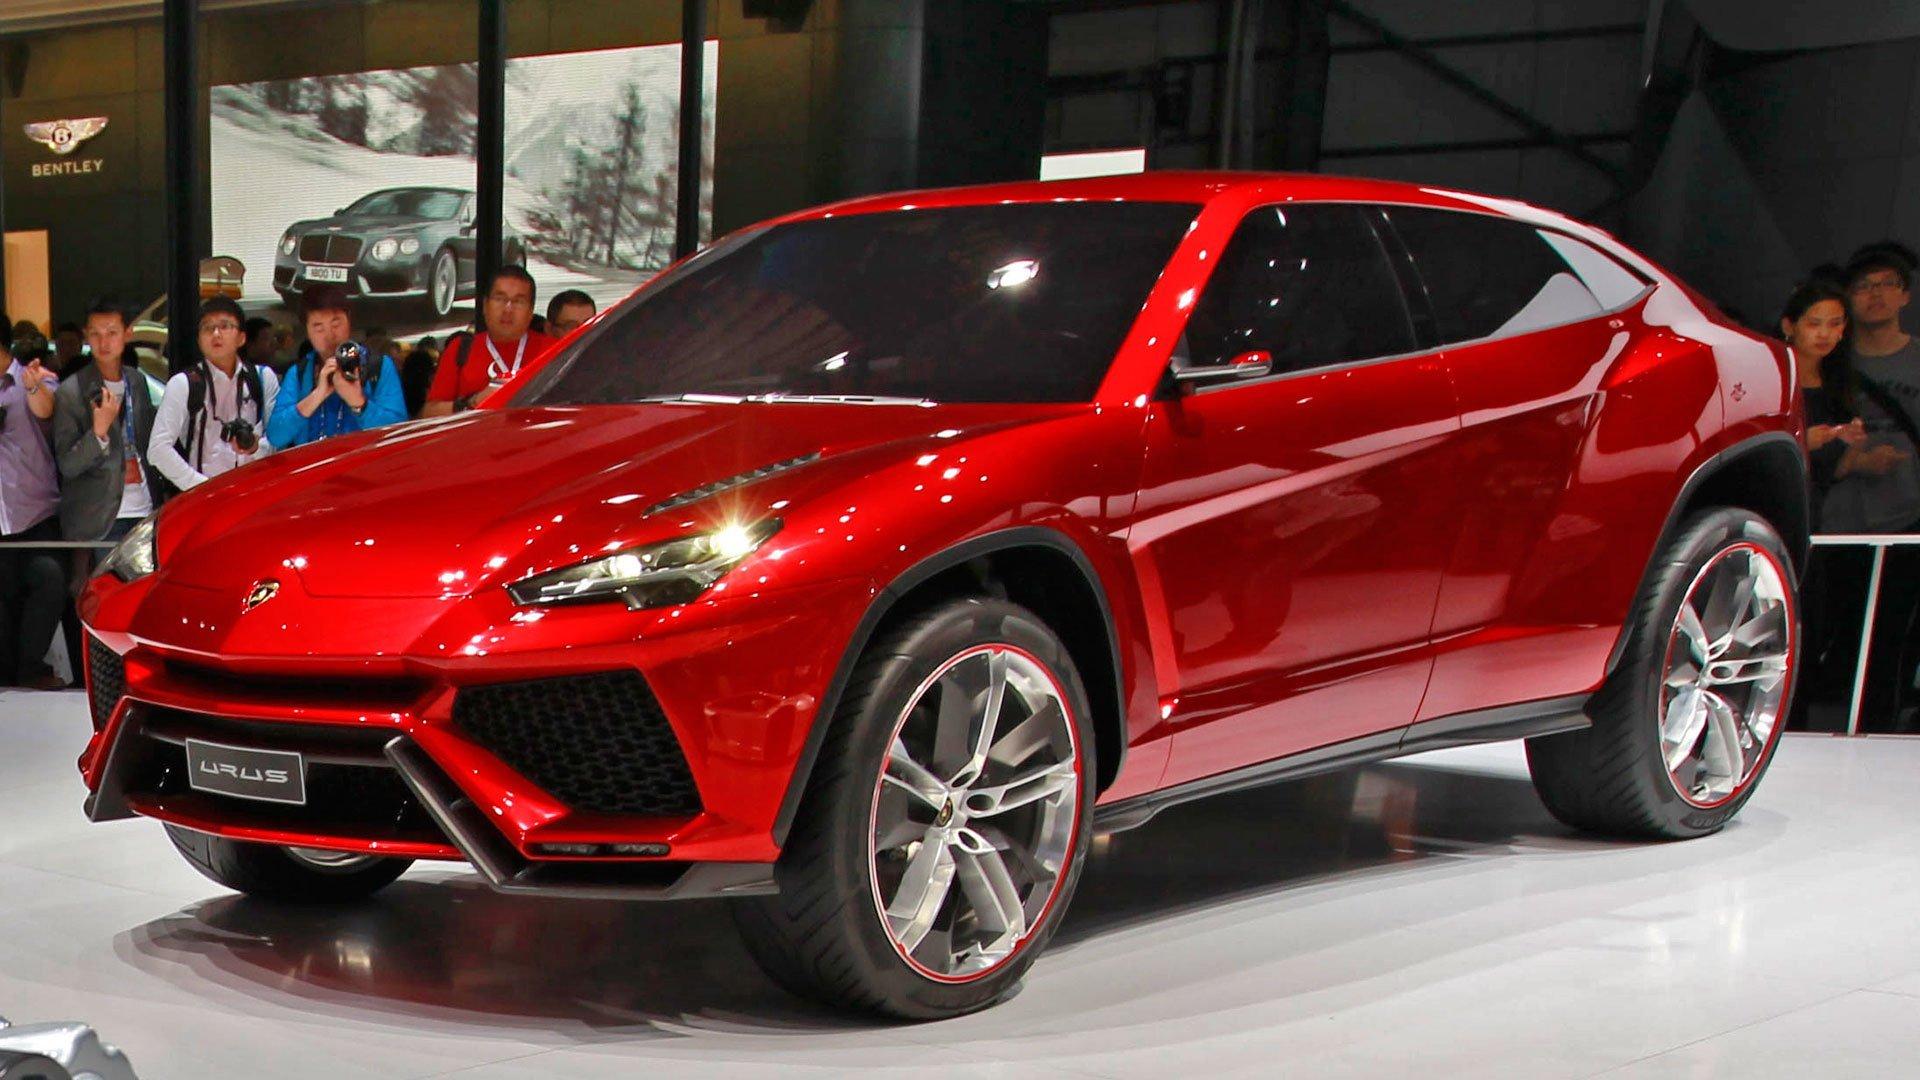 В сети представили процесс сборки кроссовера Lamborghini Urus